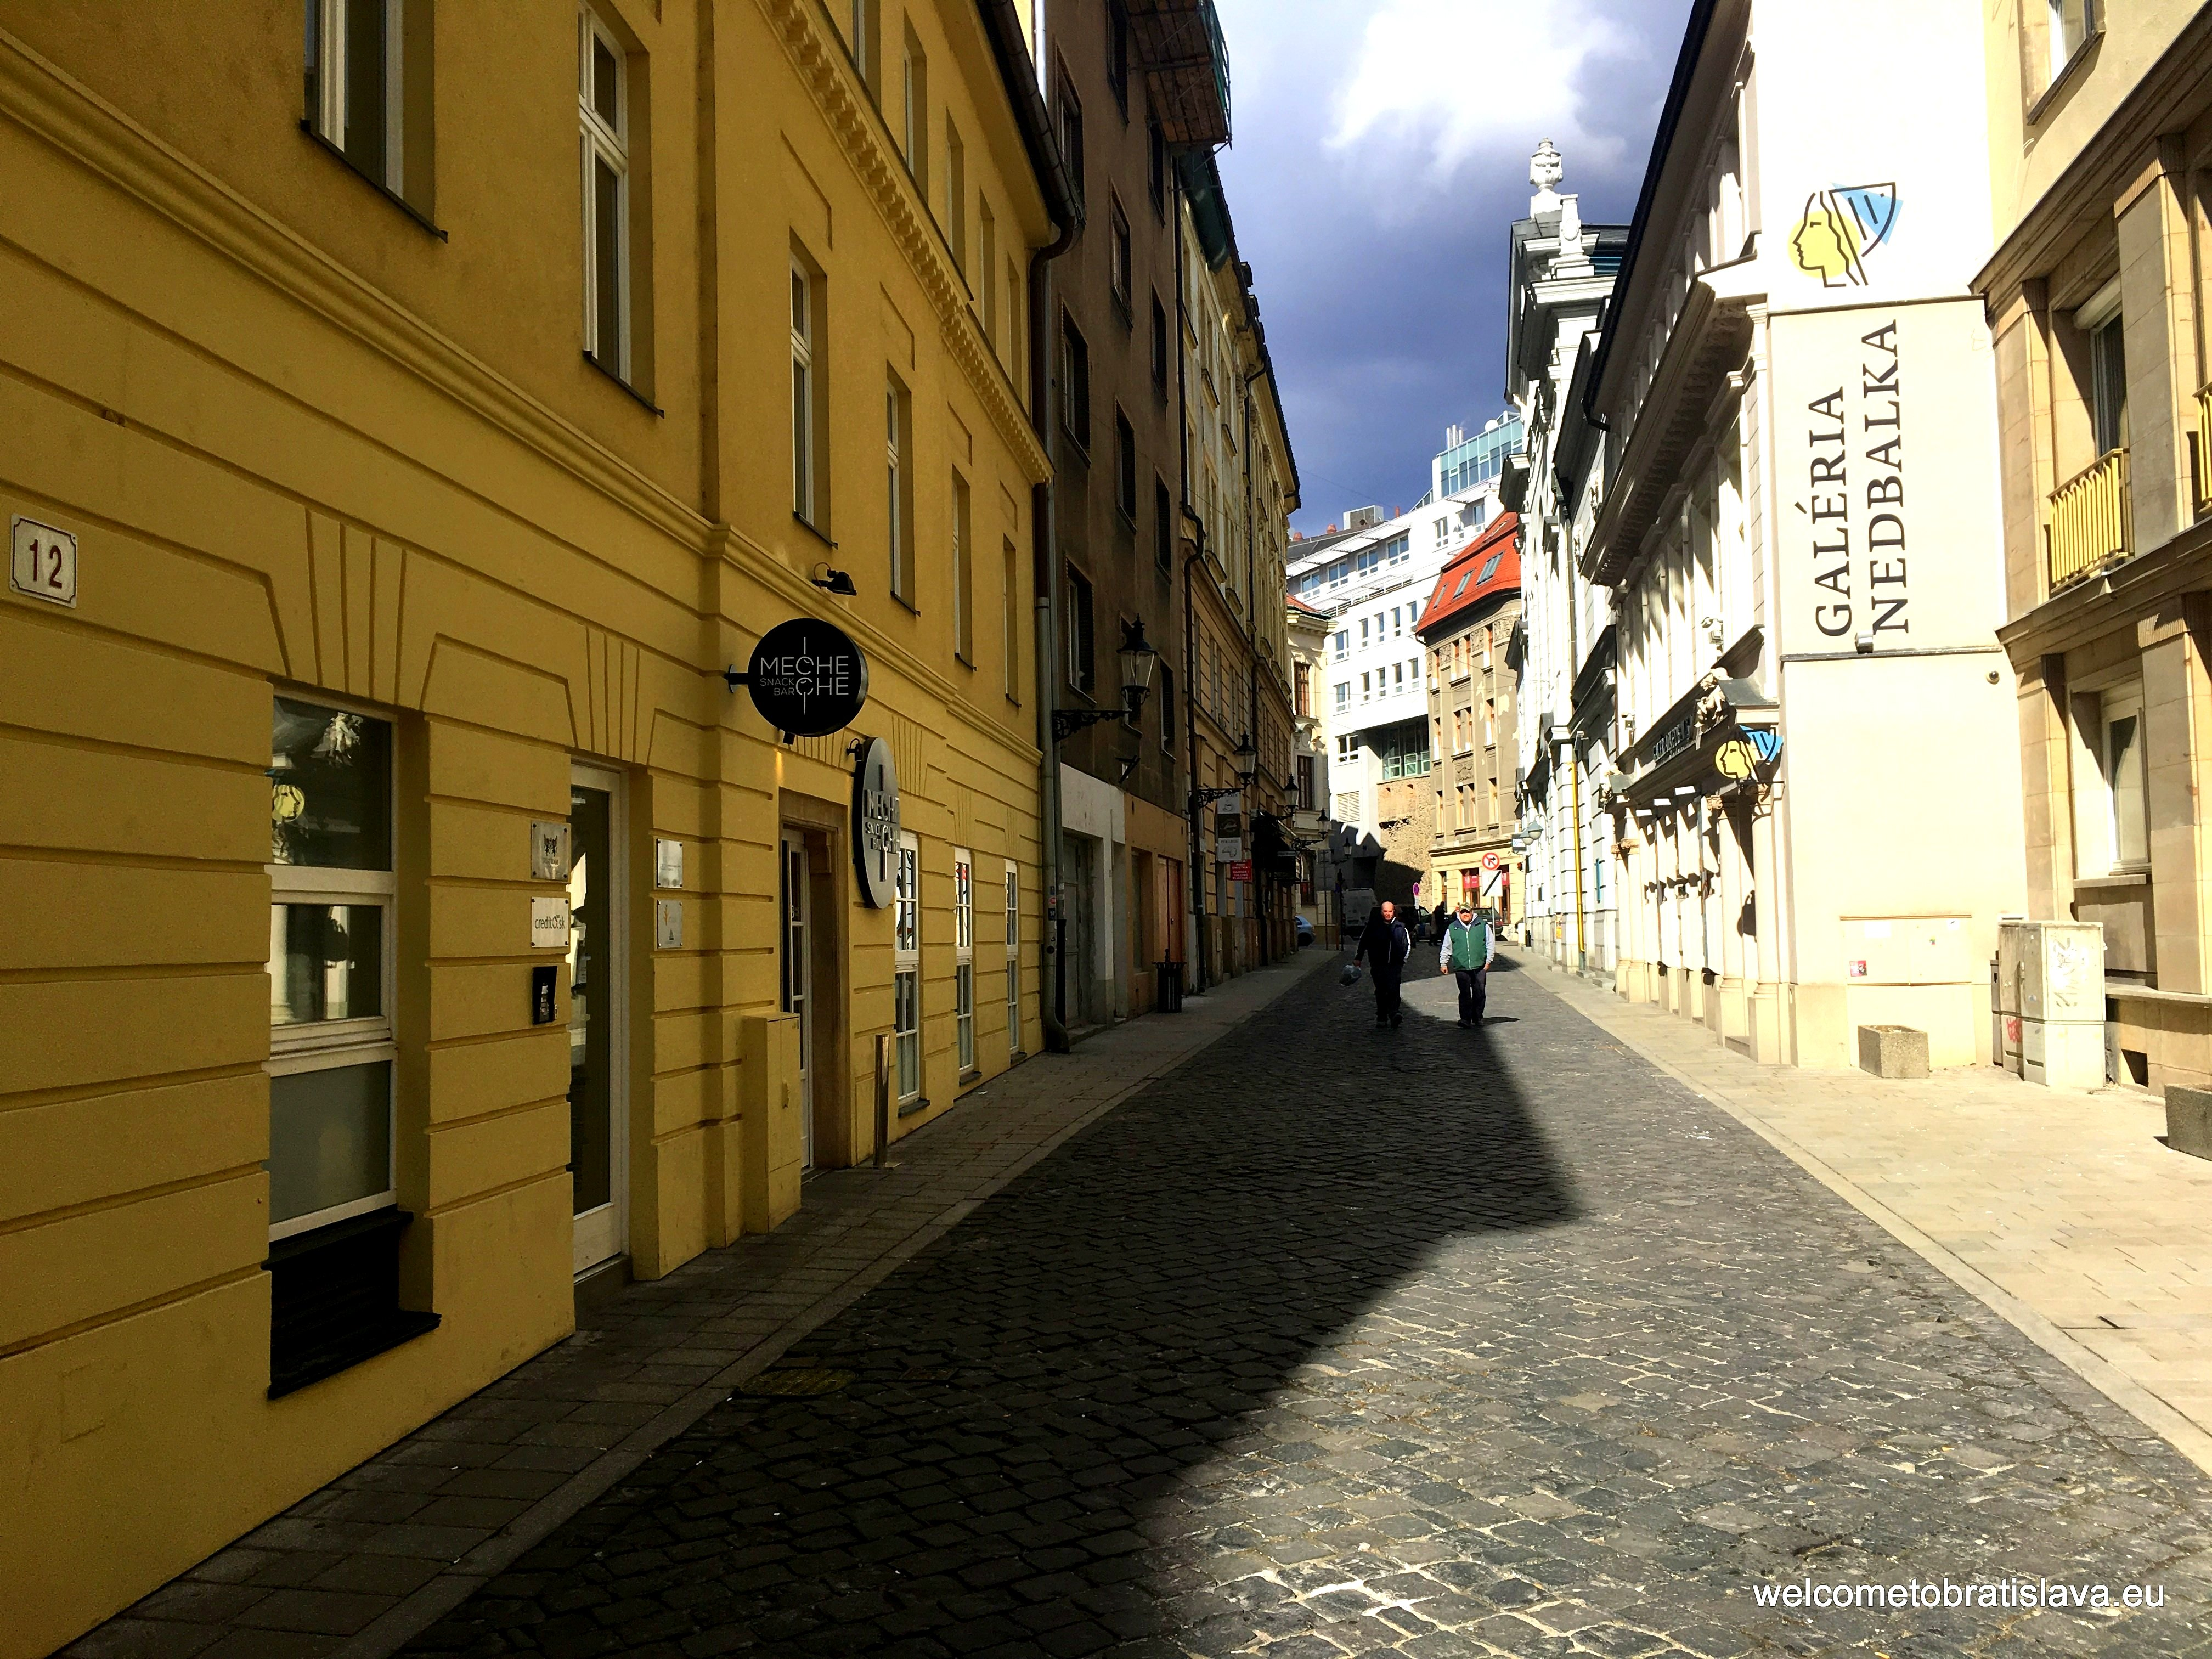 Nedbalova Street - Nedbalka Gallery